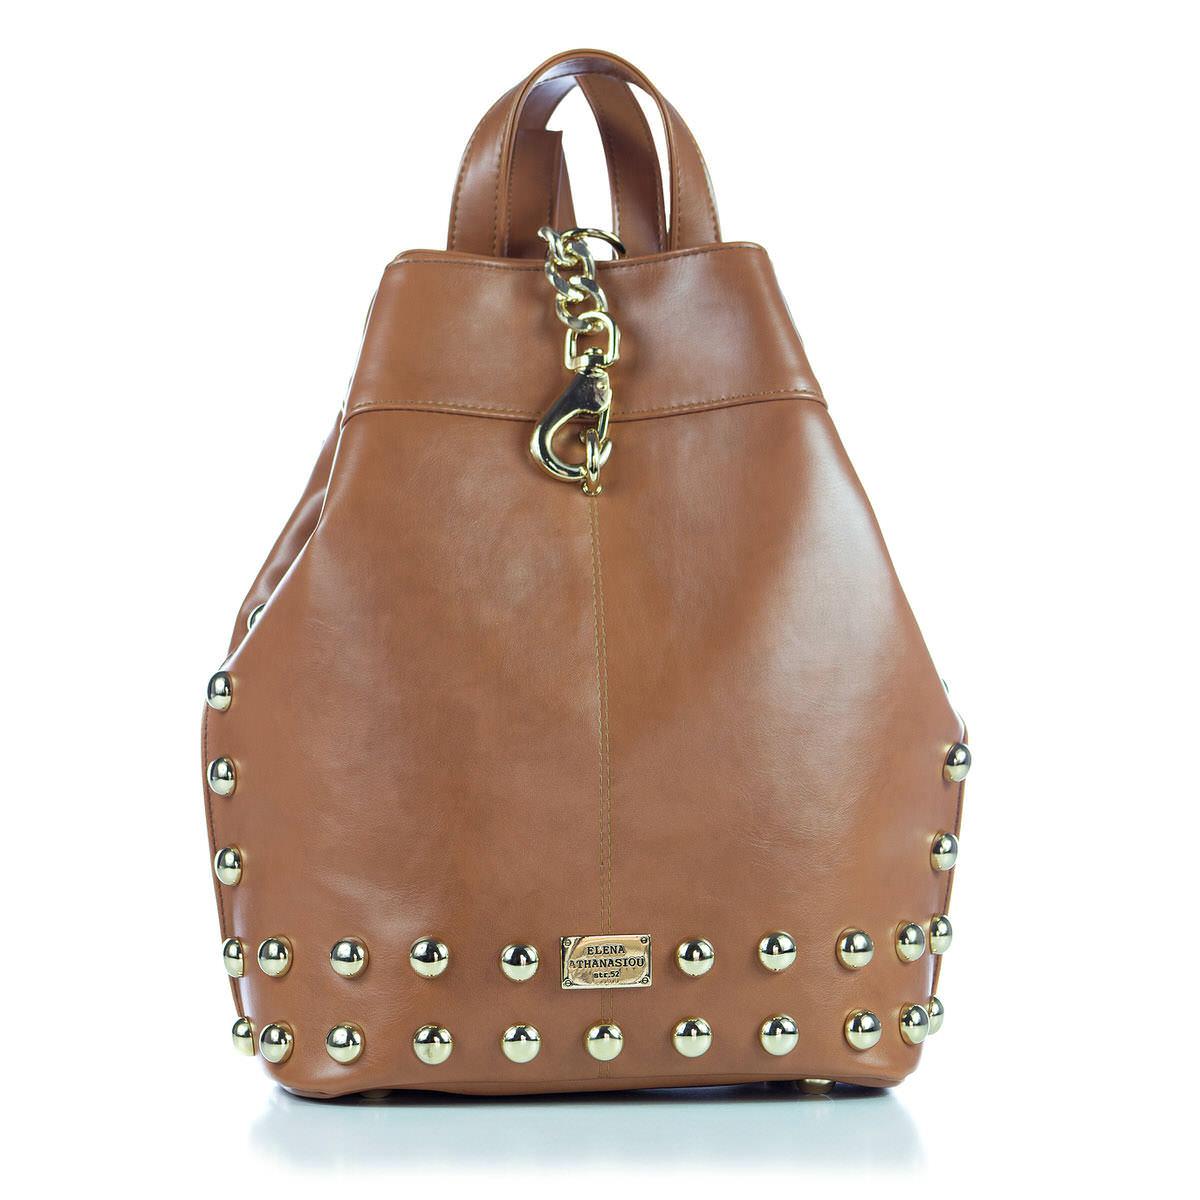 Backpack Cognac - Δερμάτινες Γυναικείες Τσάντες  4b17871c6c4